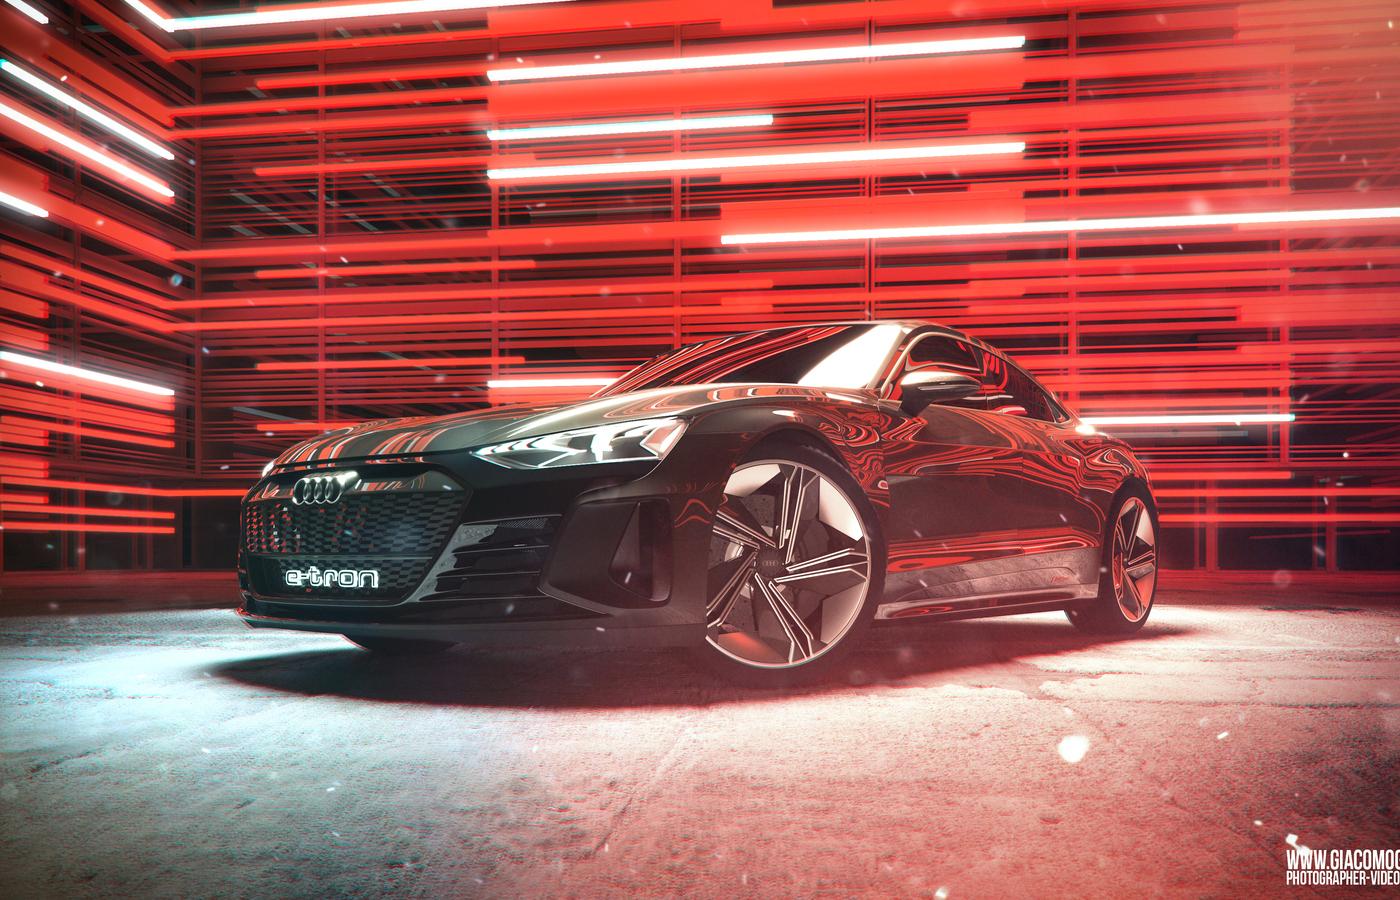 audi-etron-gt-automotive-rendering-4k-30.jpg